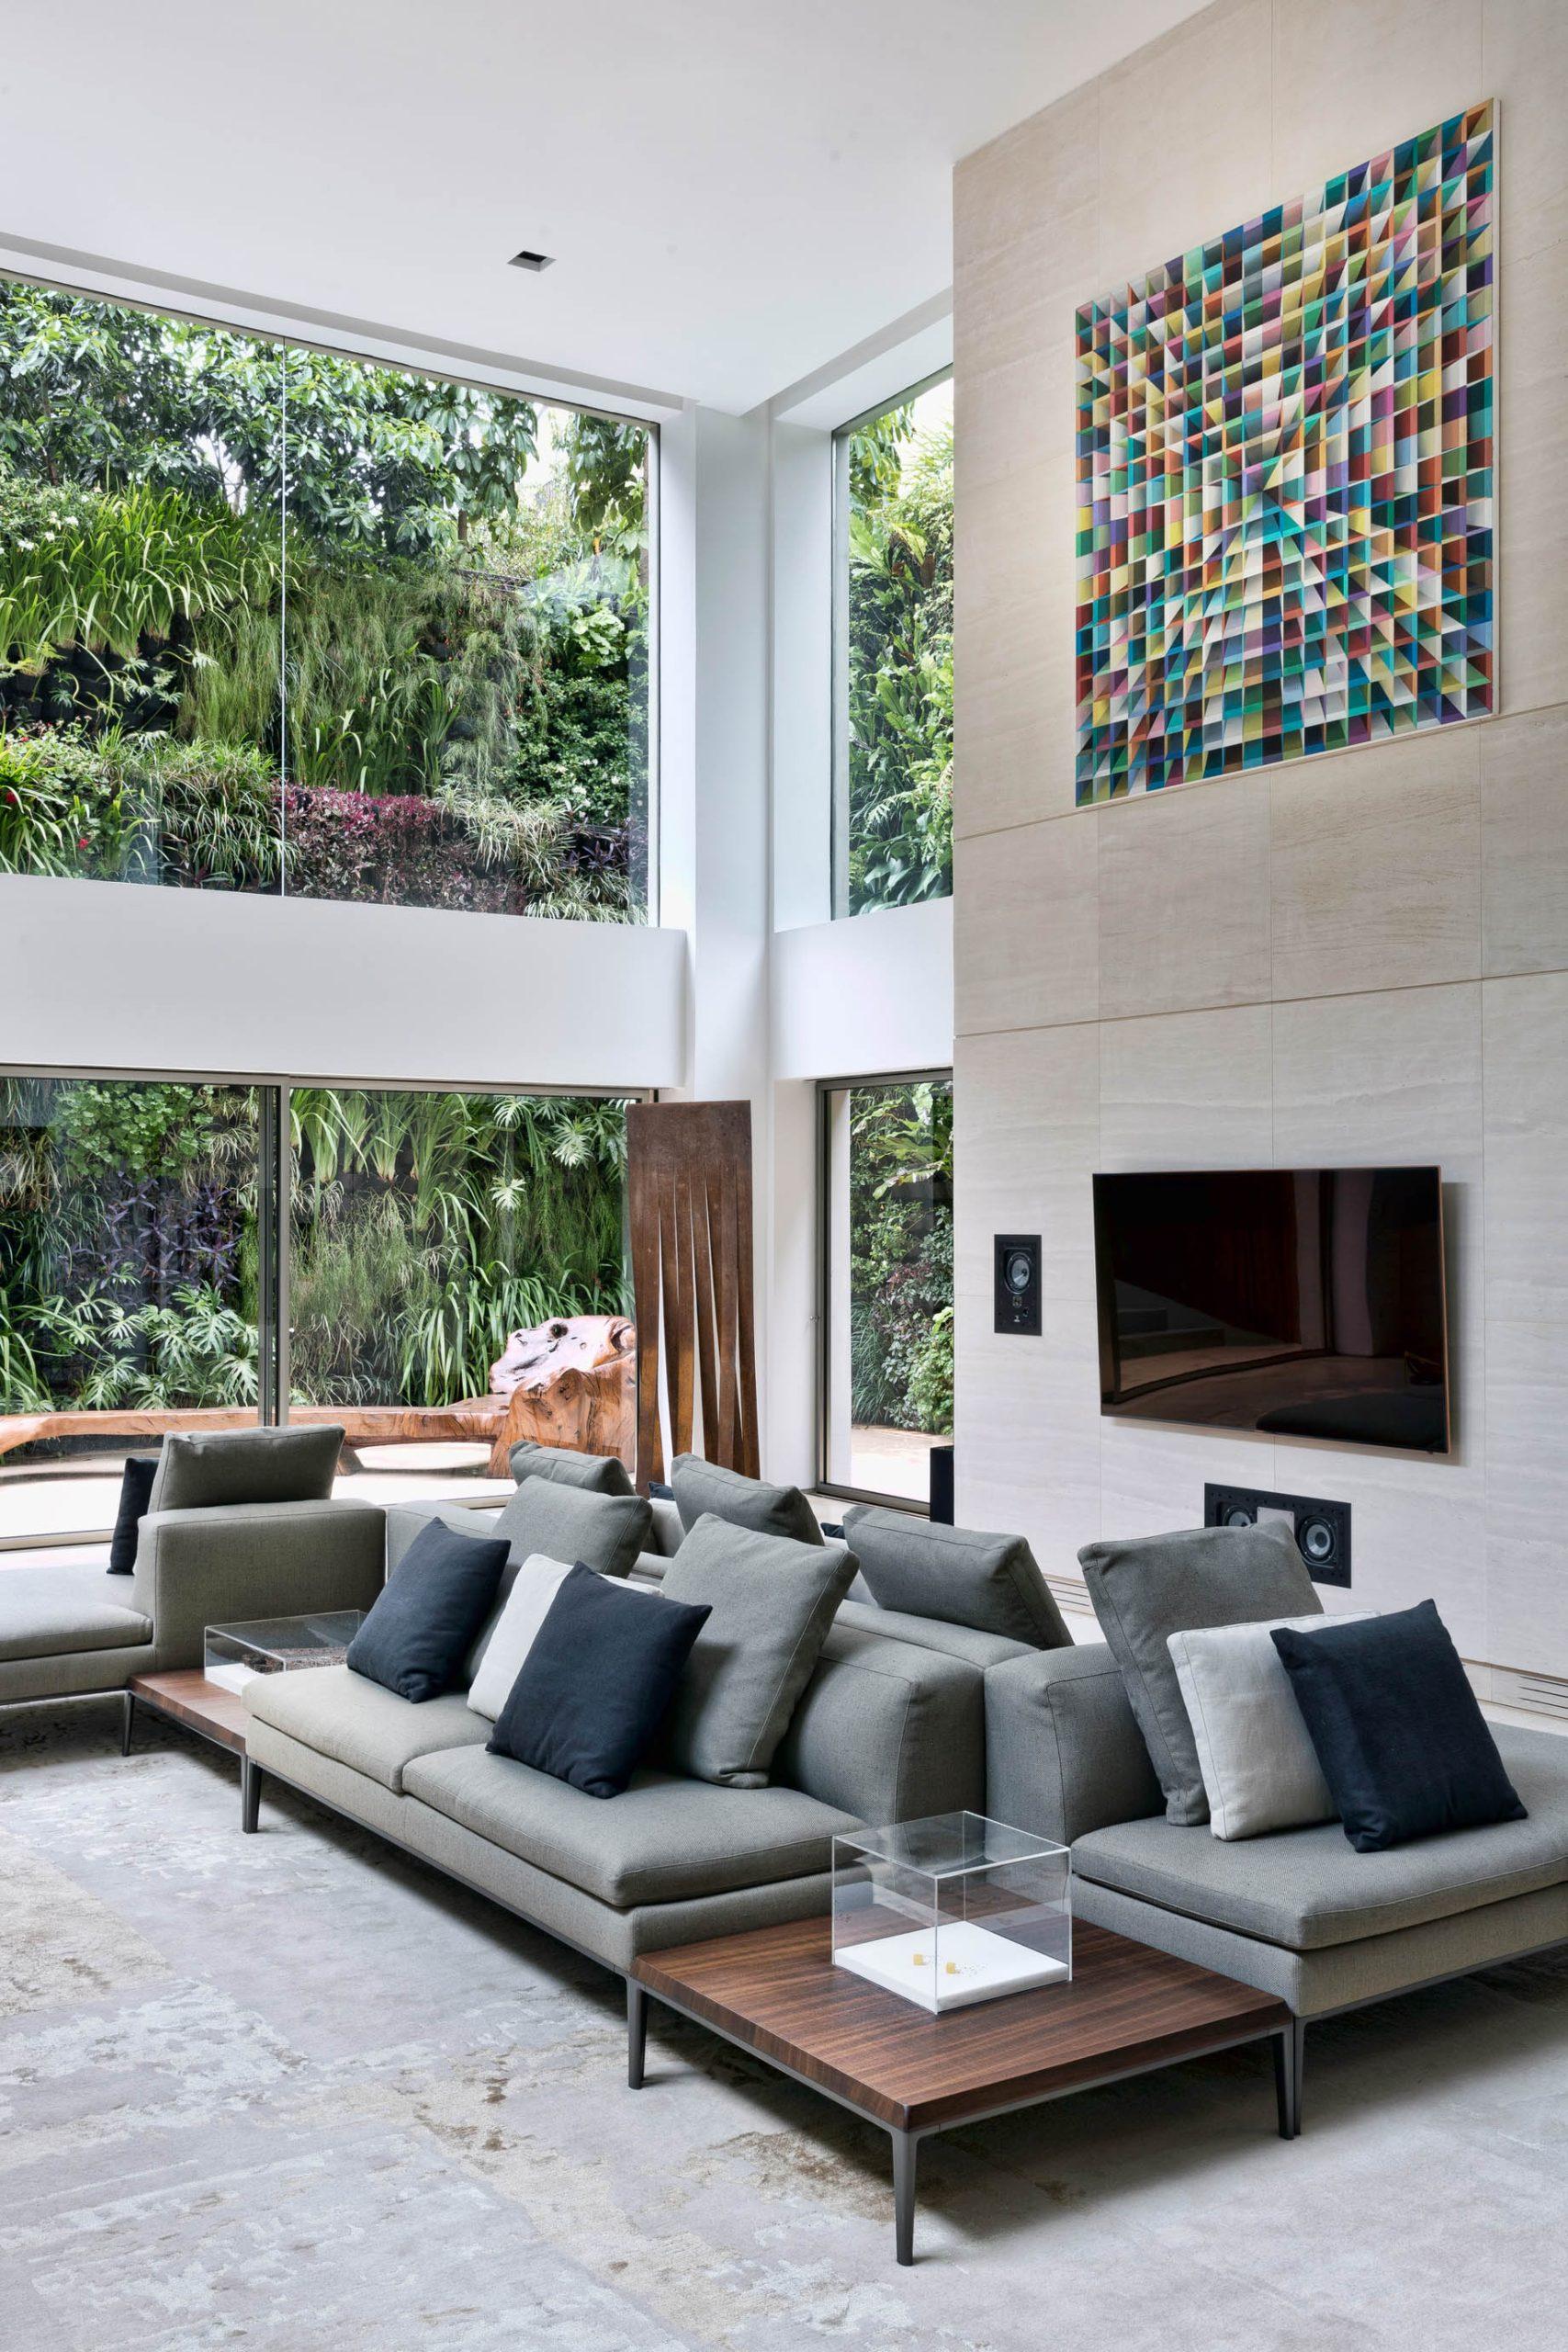 Panorama Swimming Pool House – Vila Nova Conceicao, Sao Paulo, Brazil